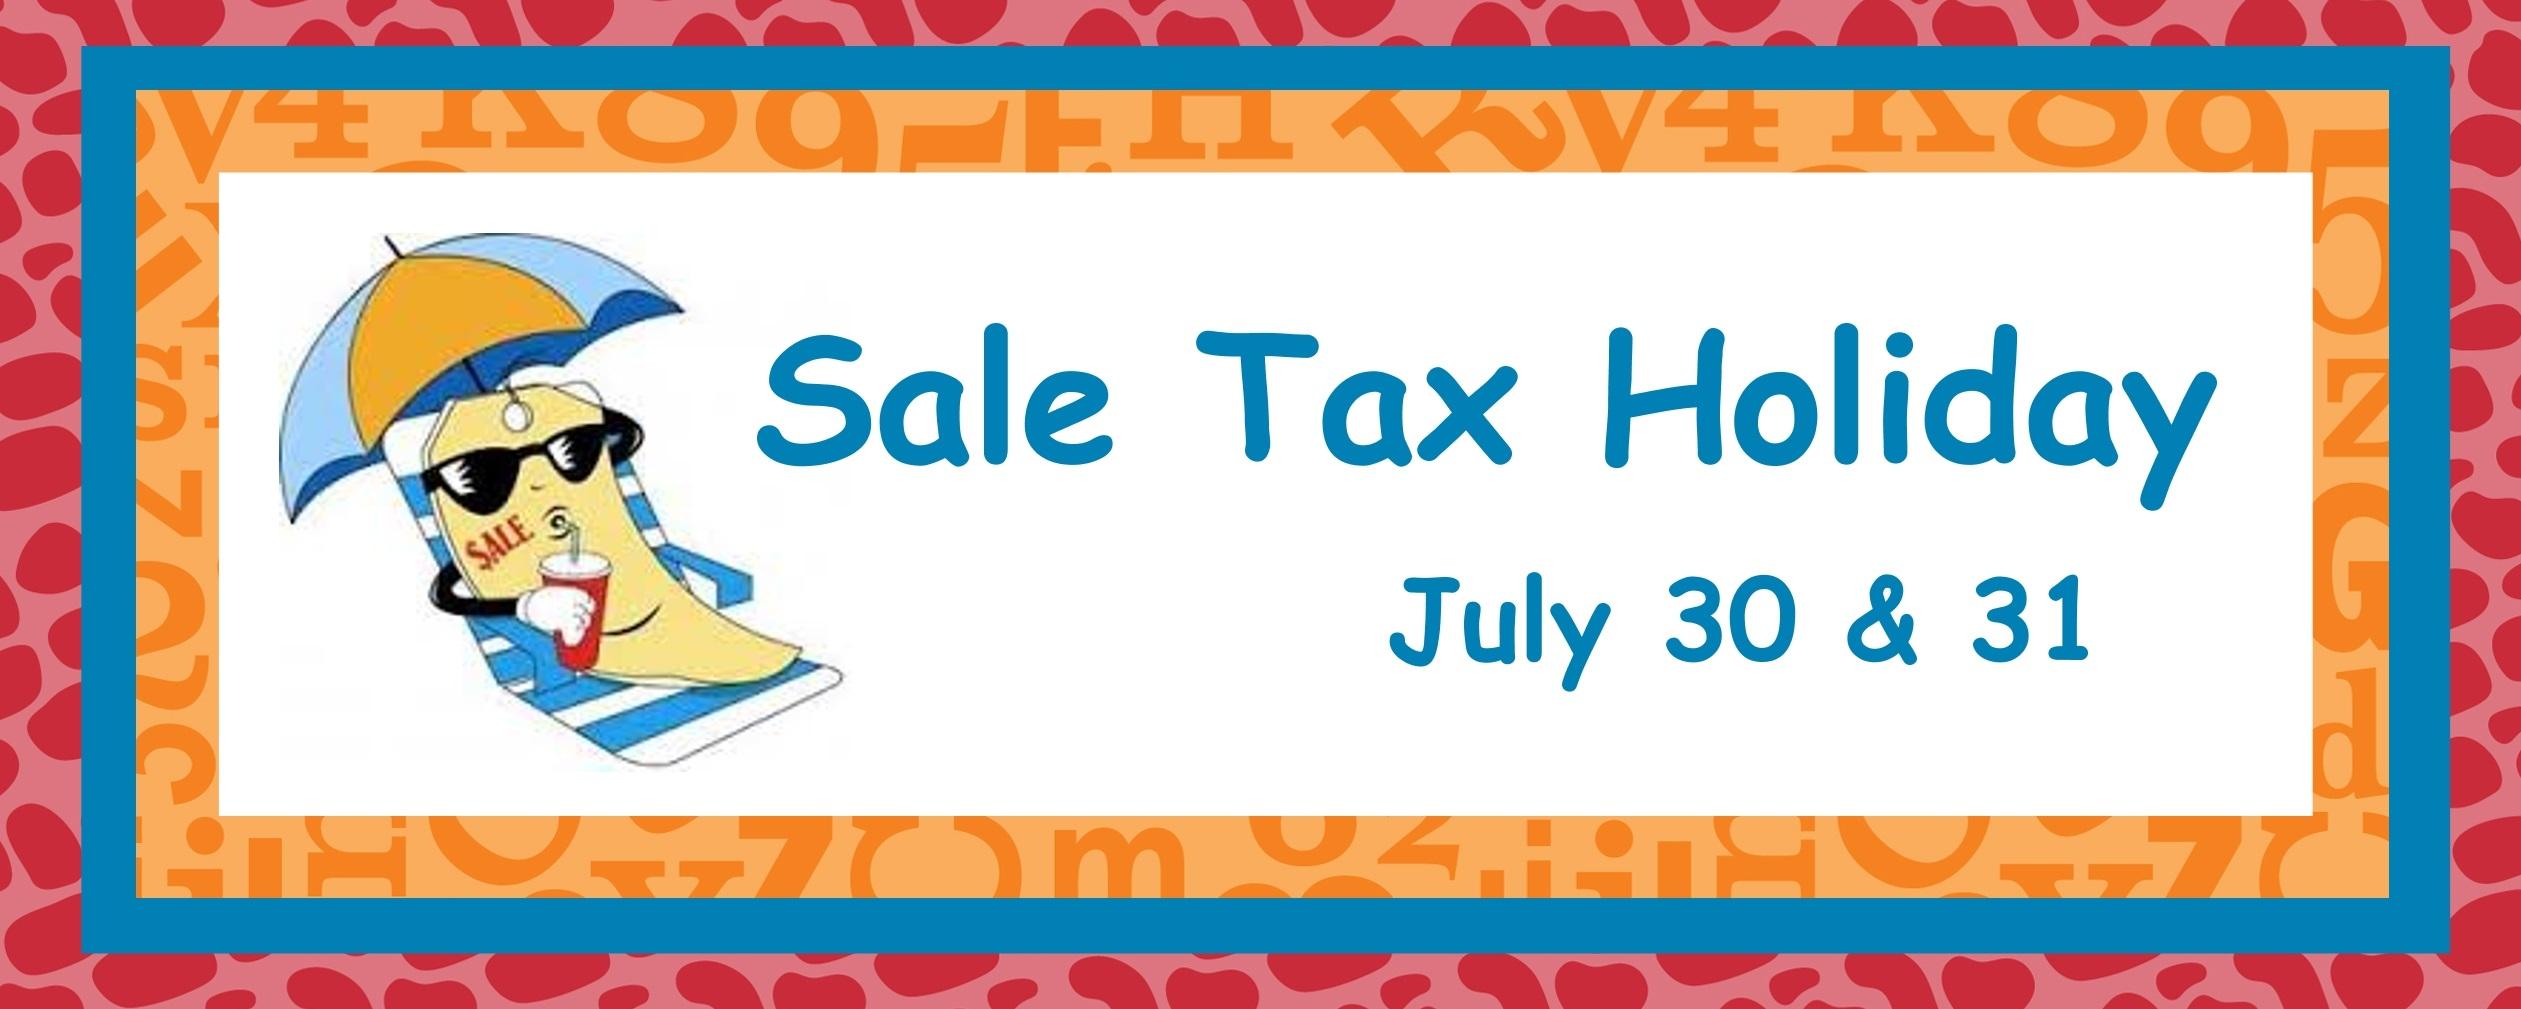 Tax Free 2016 banner